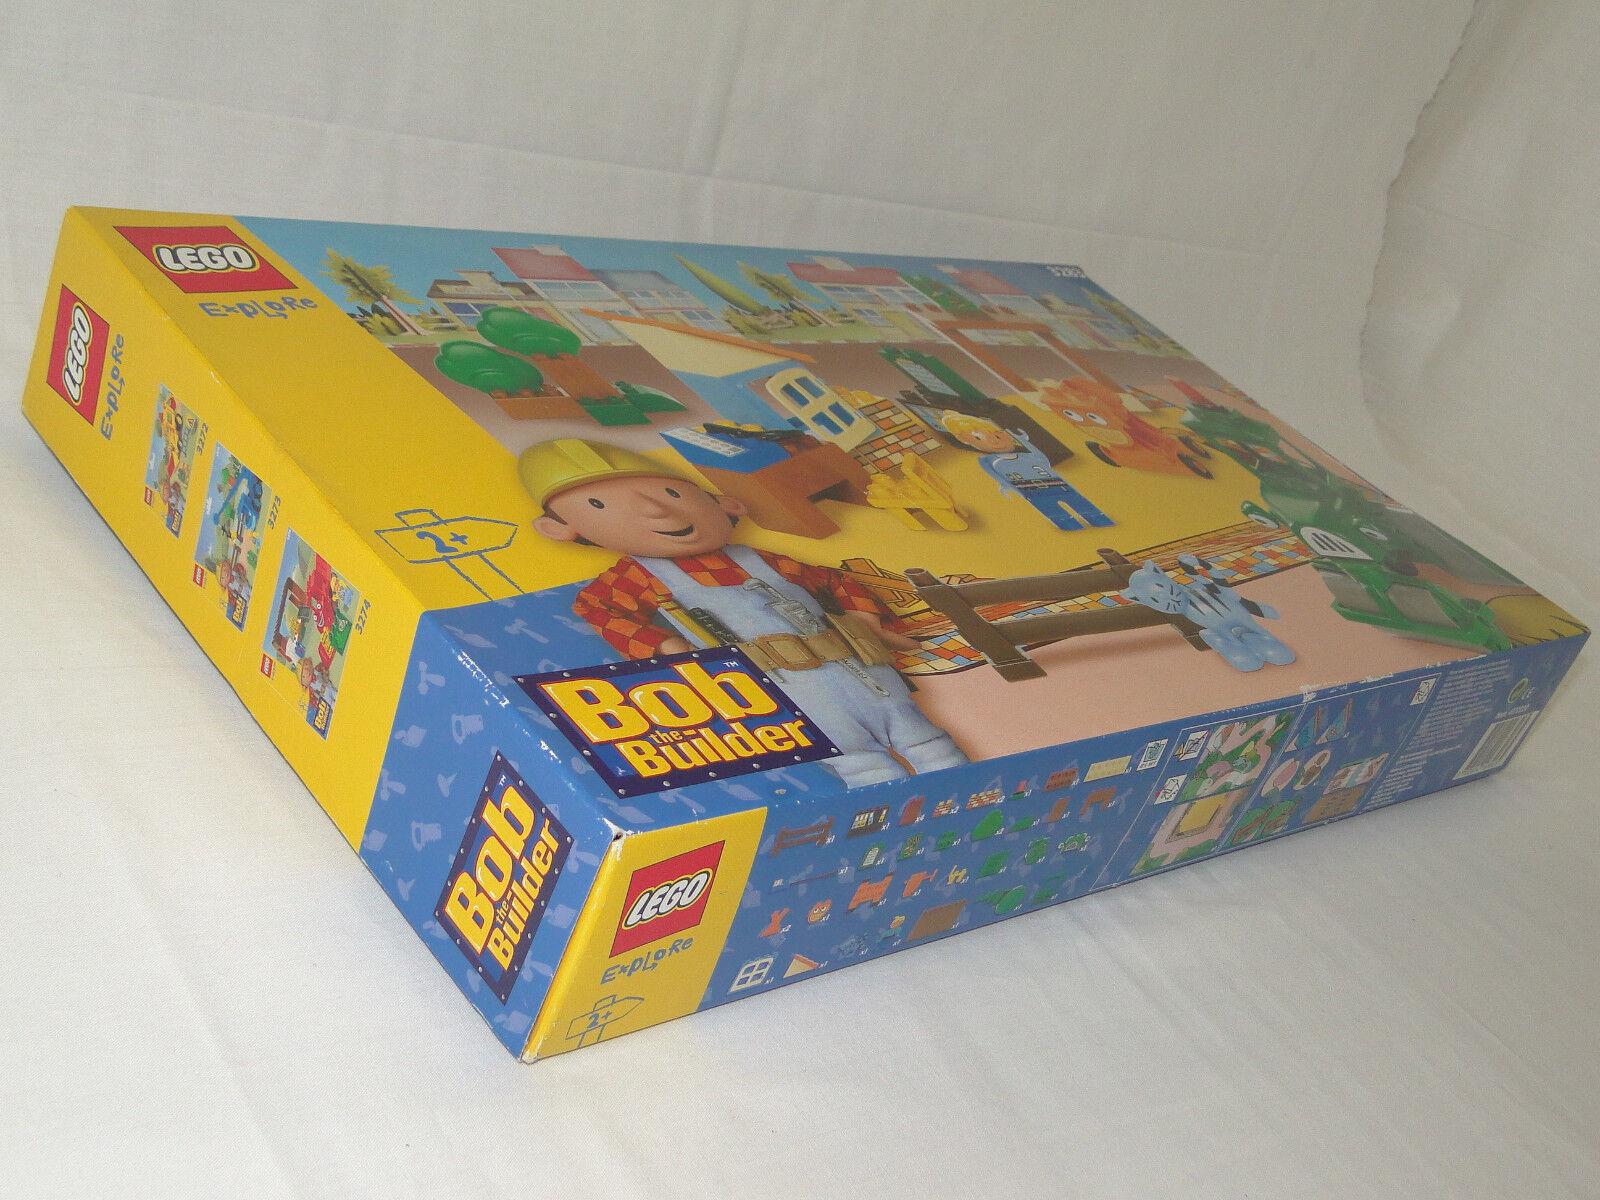 Lego Explore Bob Baumeister 3283 3283 3283 Mixi Vogelbeobachtung Dizzy´s Birdwatch NEU OVP 12a414